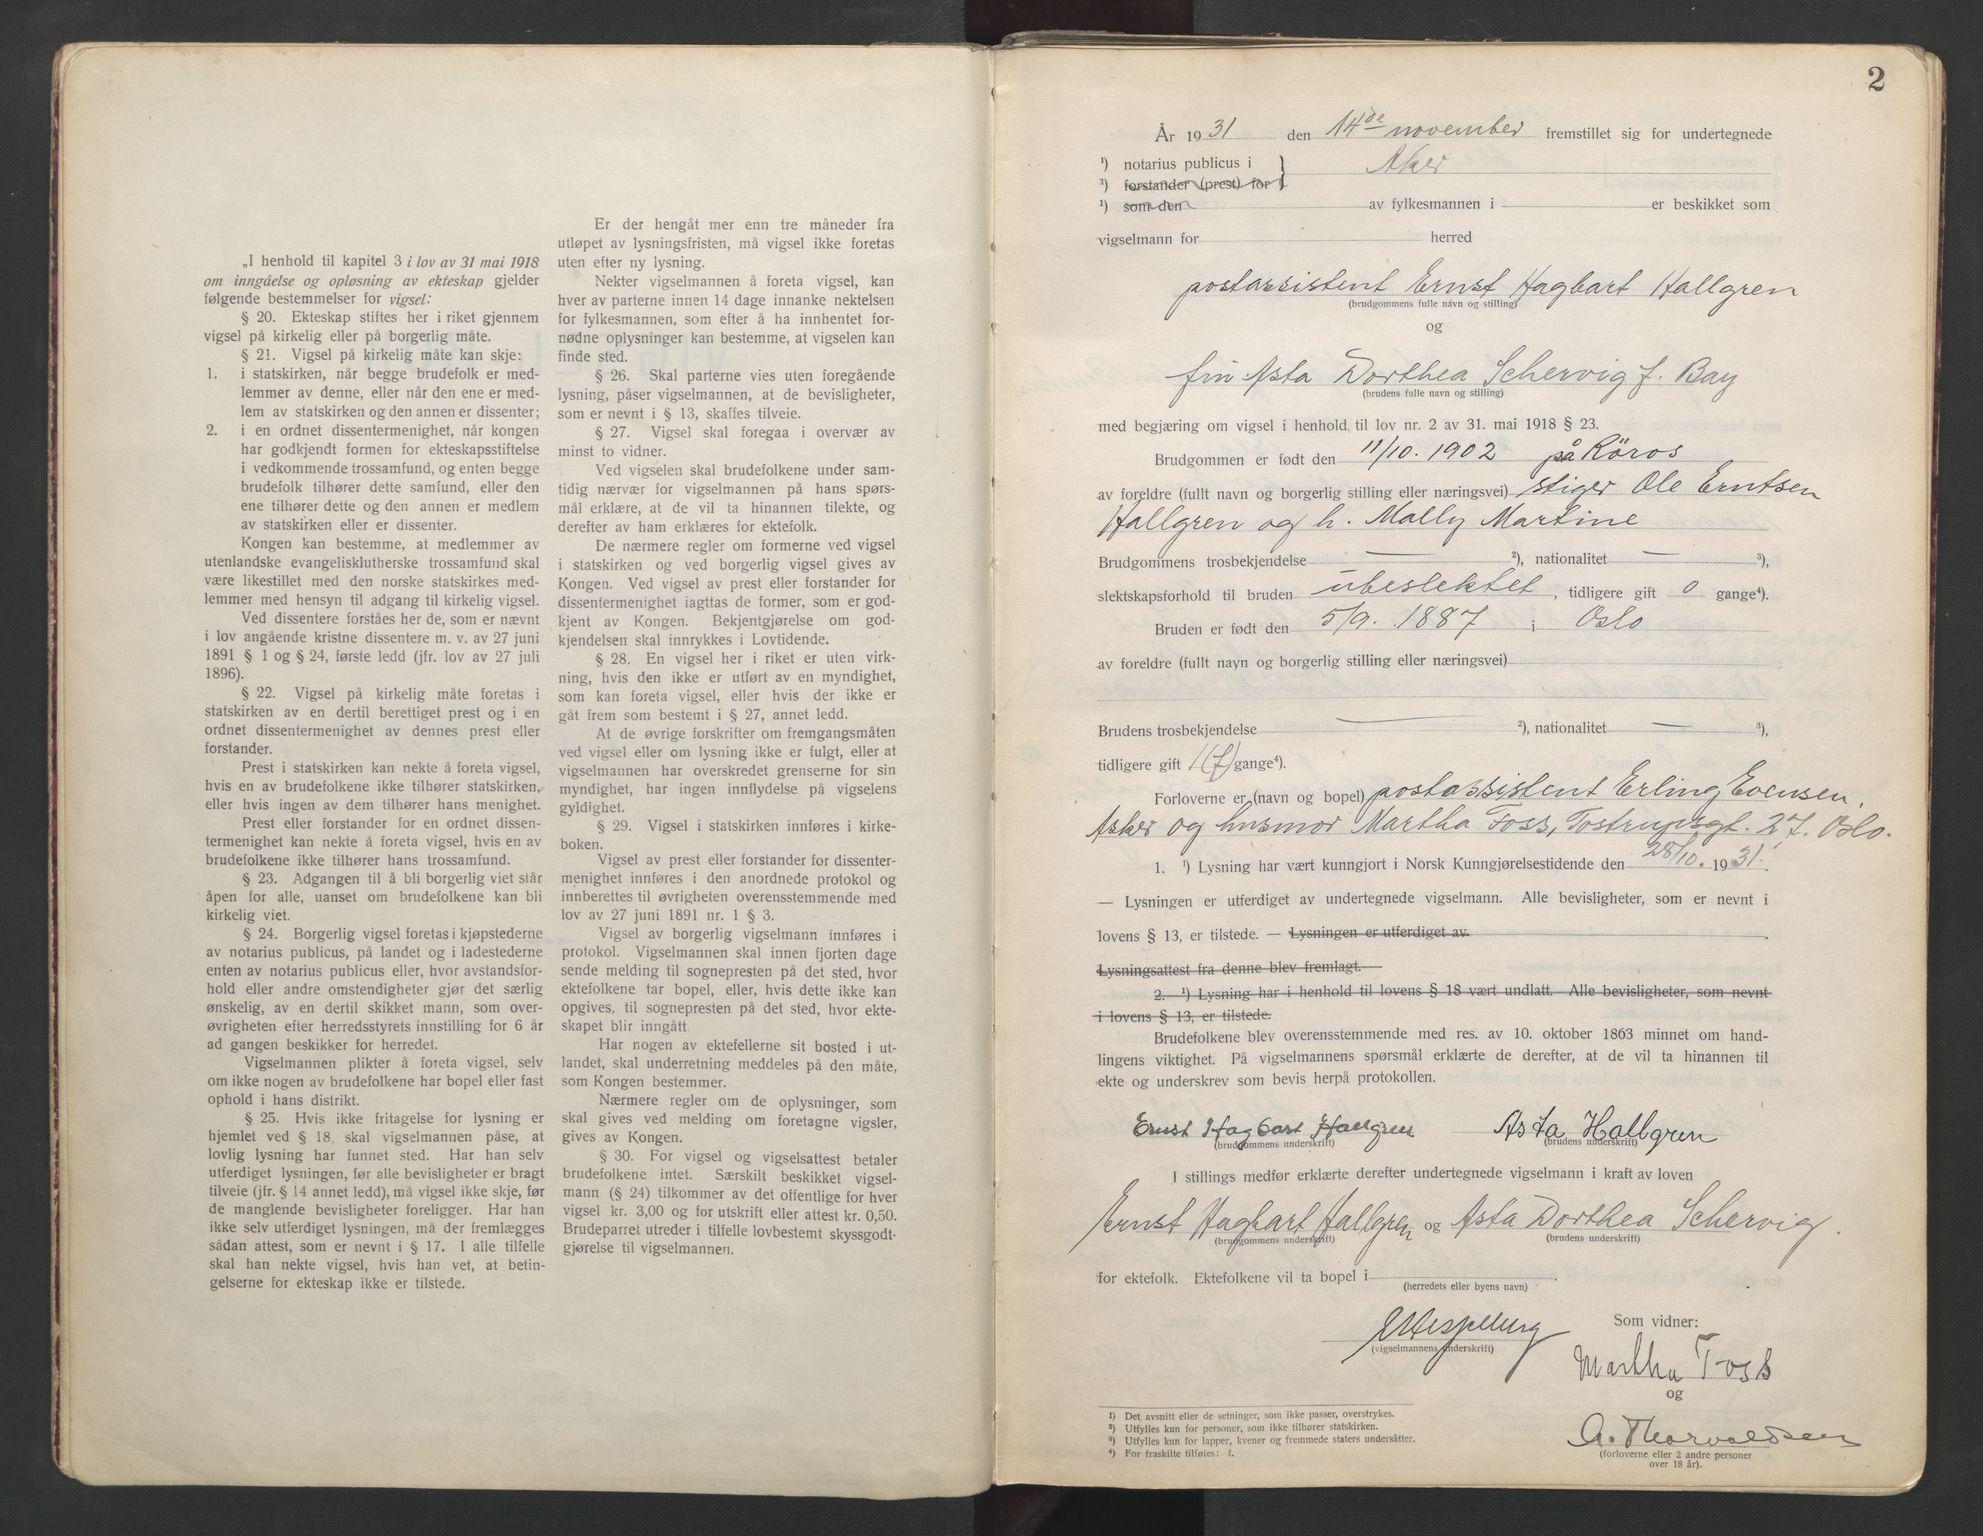 SAO, Aker sorenskriveri, L/Lc/Lcb/L0006: Vigselprotokoll, 1931-1933, s. 2